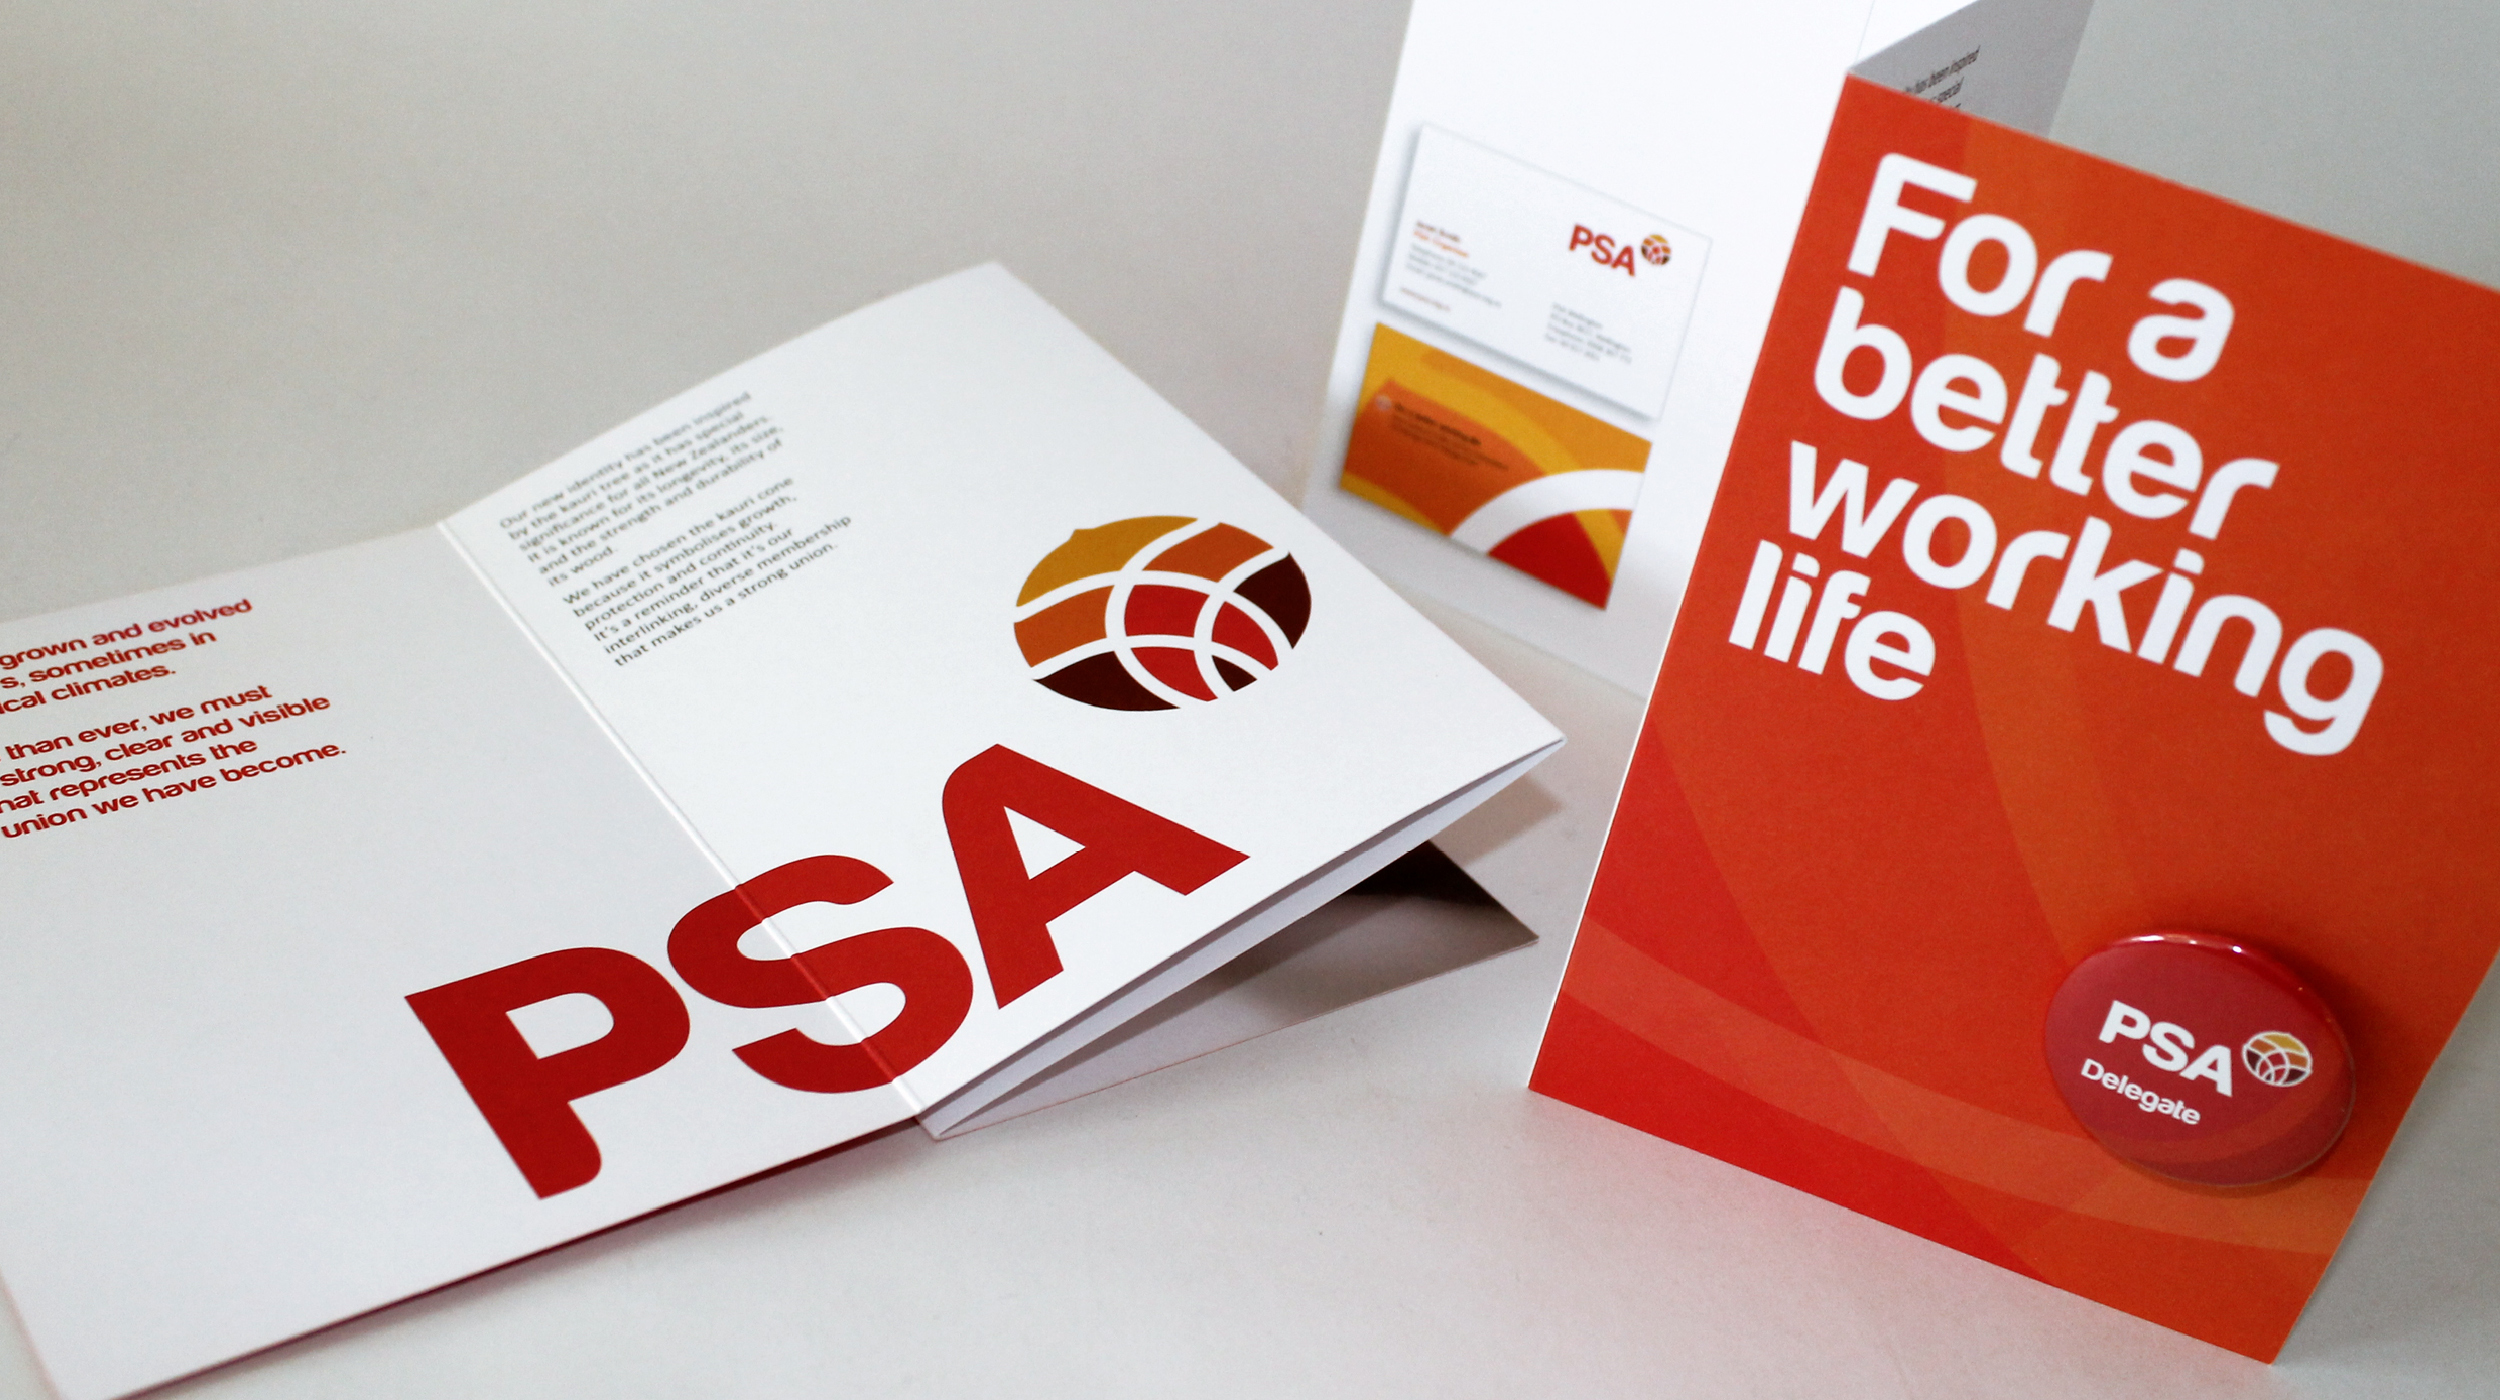 PSA Case Study_2018 25.jpg